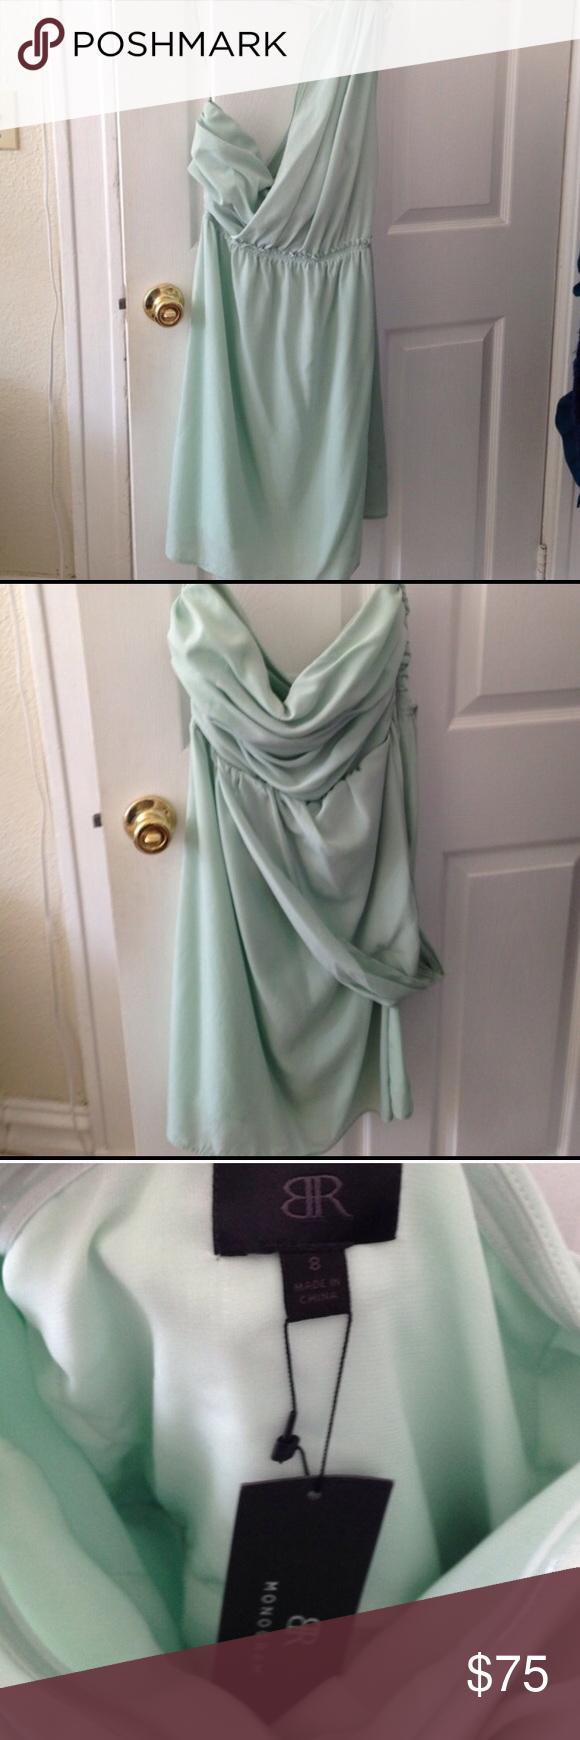 Green dress one shoulder  BR Mint Green One Shoulder Dress NWT  Mint green dress Mint green